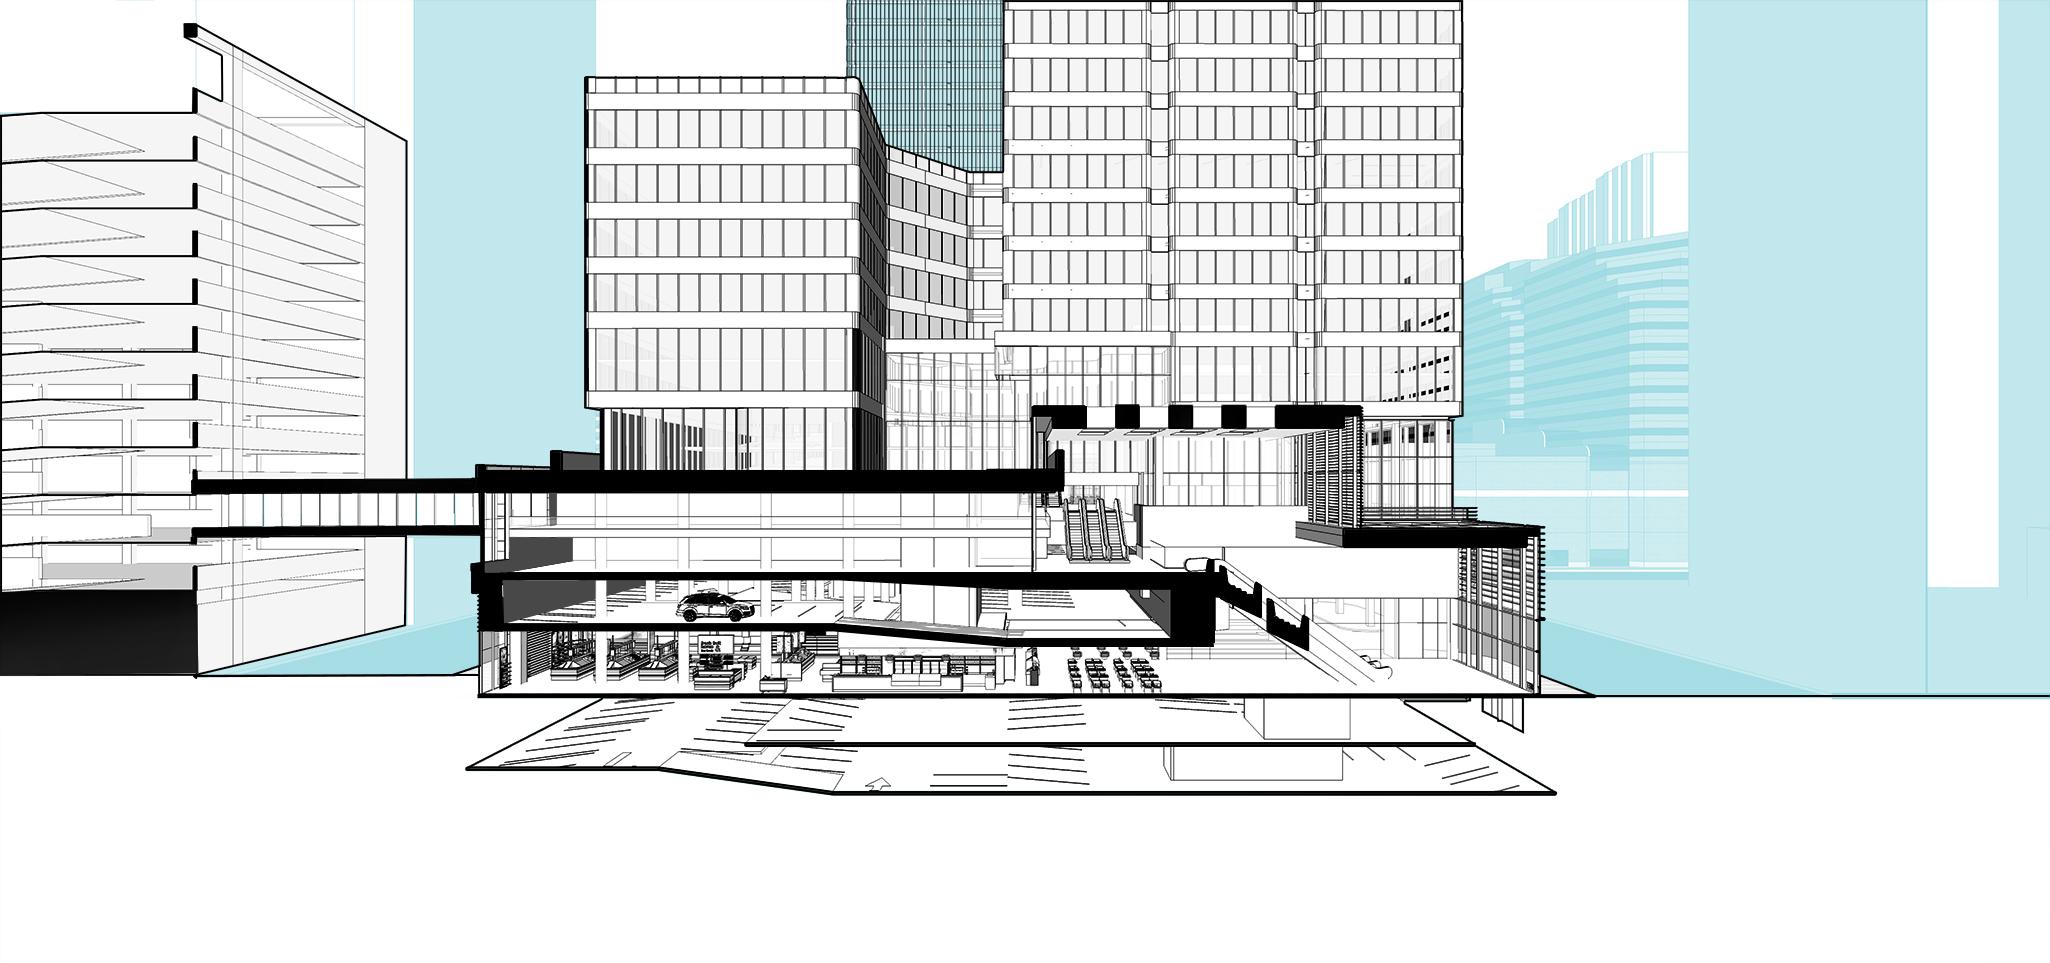 (7/7) Houston Center - Campus Renovation